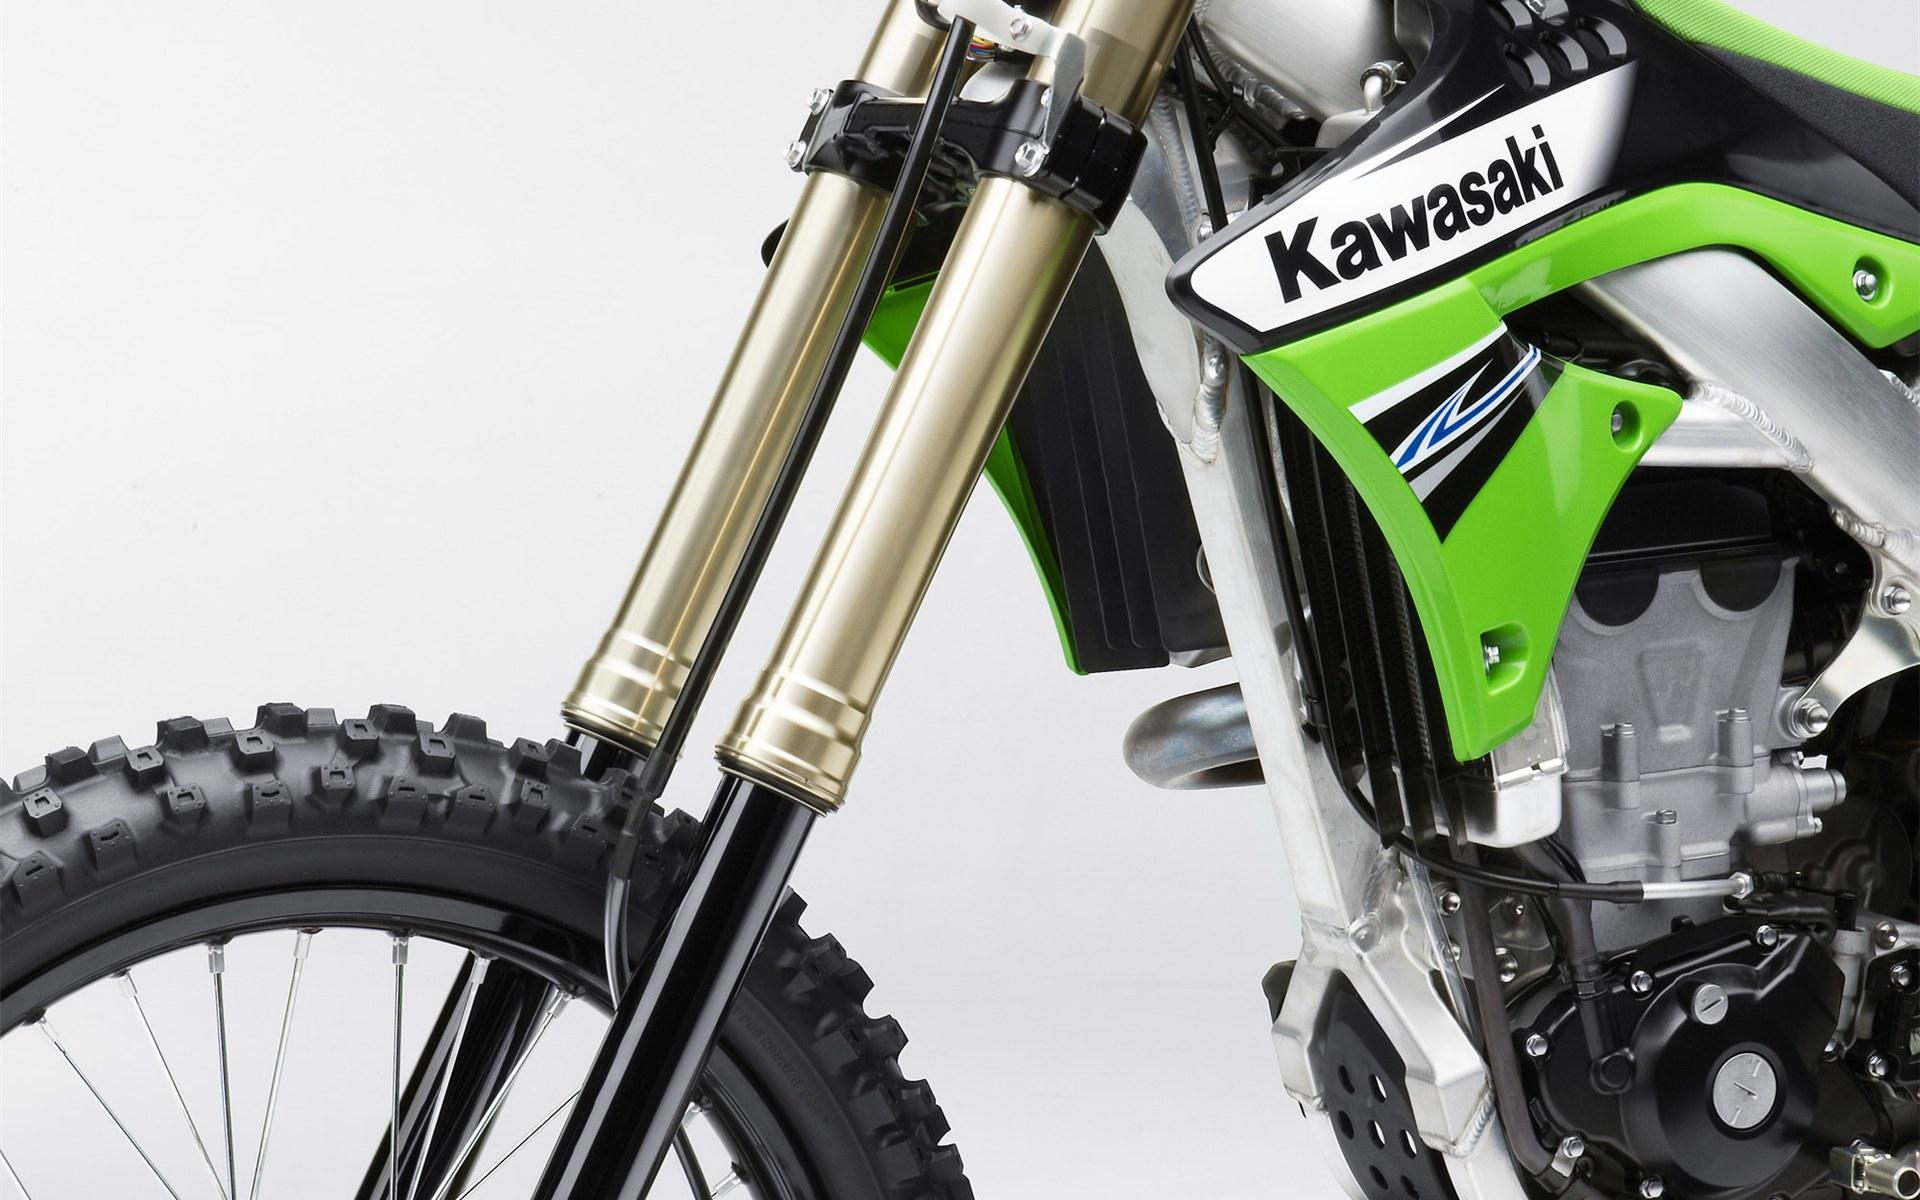 Мануалы и документация для Kawasaki KX 450 F (KX450F)